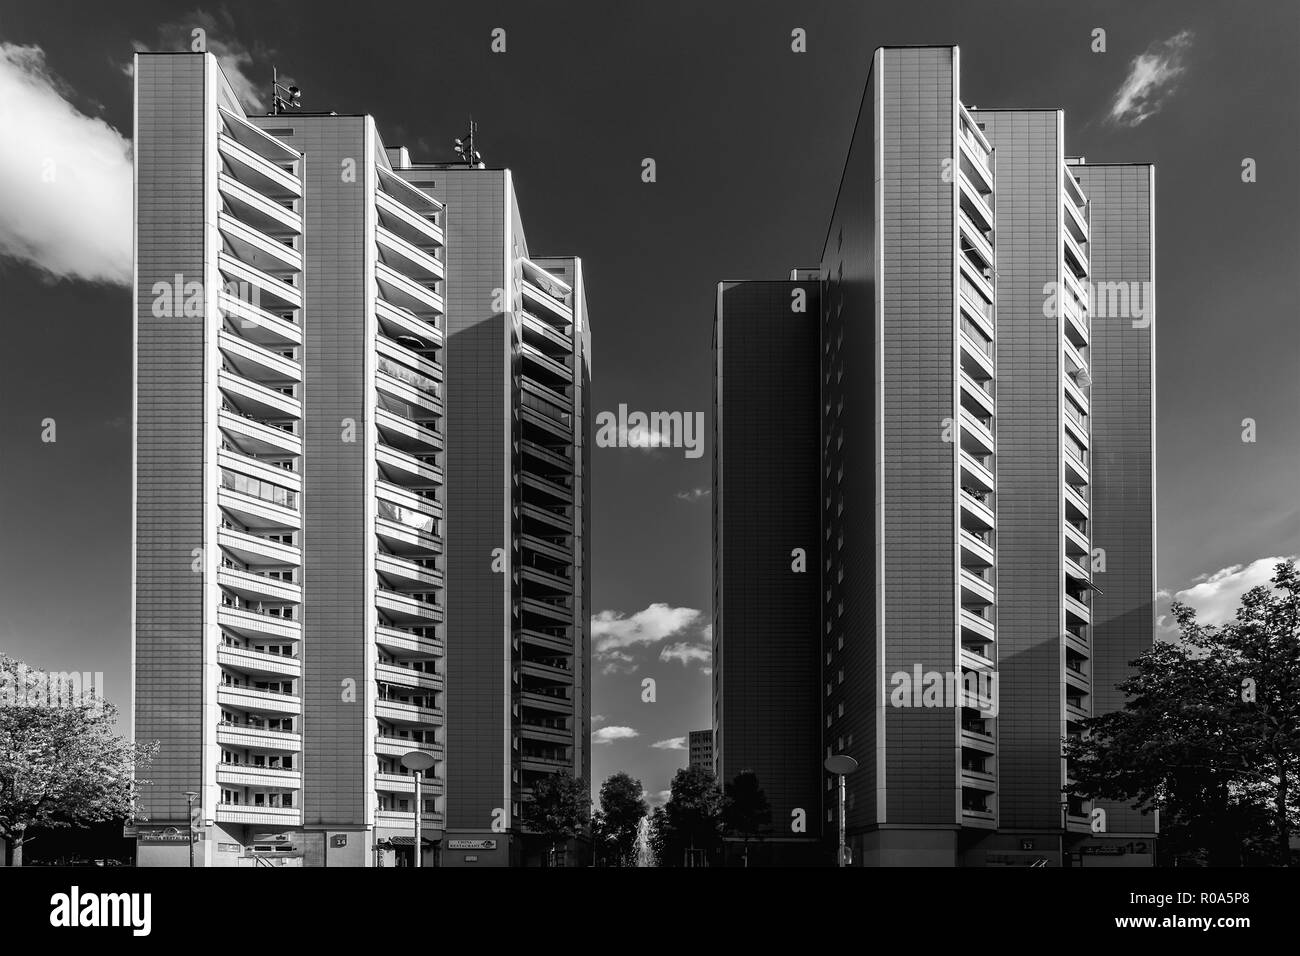 Socialist architecture, Marzahn - Stock Image